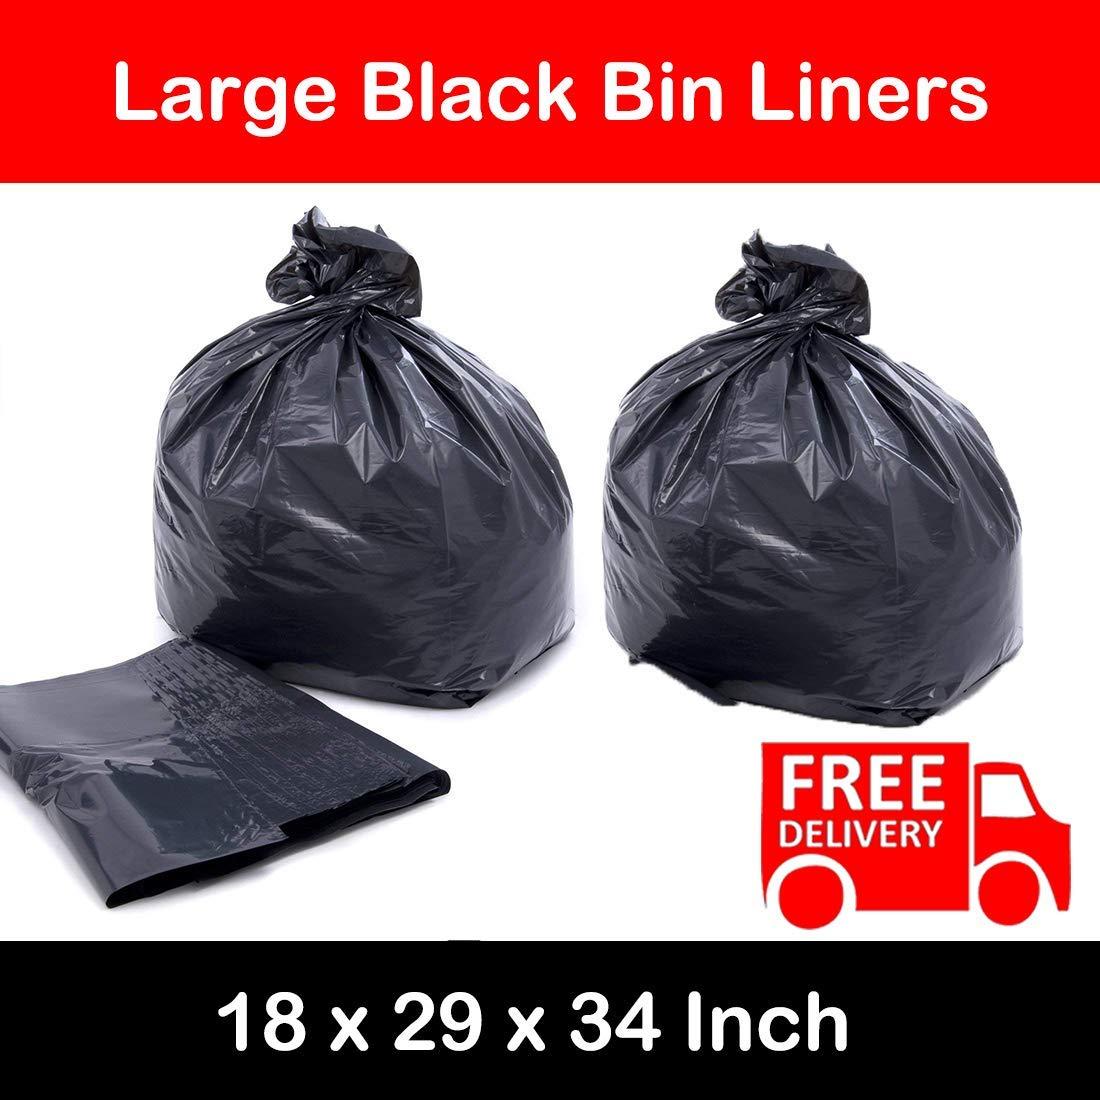 BLACK HEAVY DUTY LARGE REFUSE BAGS SACKS BIN LINERS RUBBISH 18x29x34 INCH BULK (100) Elite-Packaging